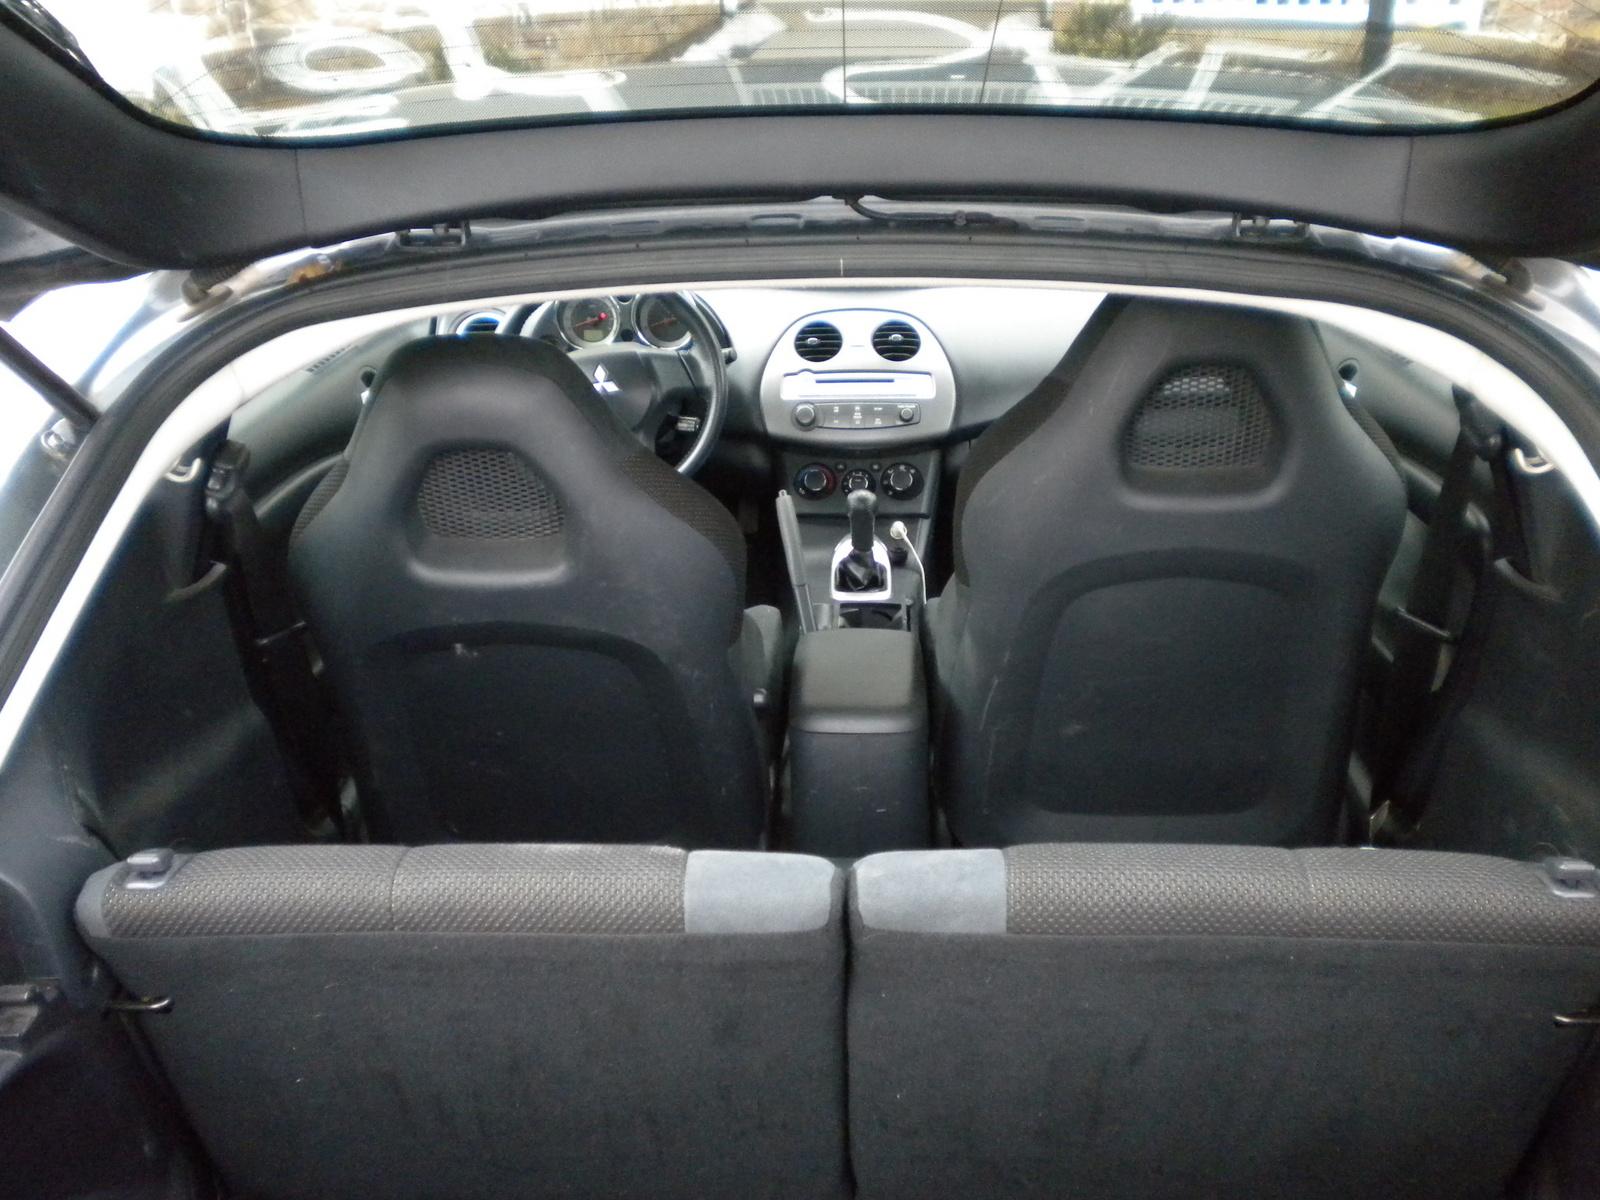 Mitsubishi Eclipse Gs Pic on 1999 Mitsubishi Galant Specs